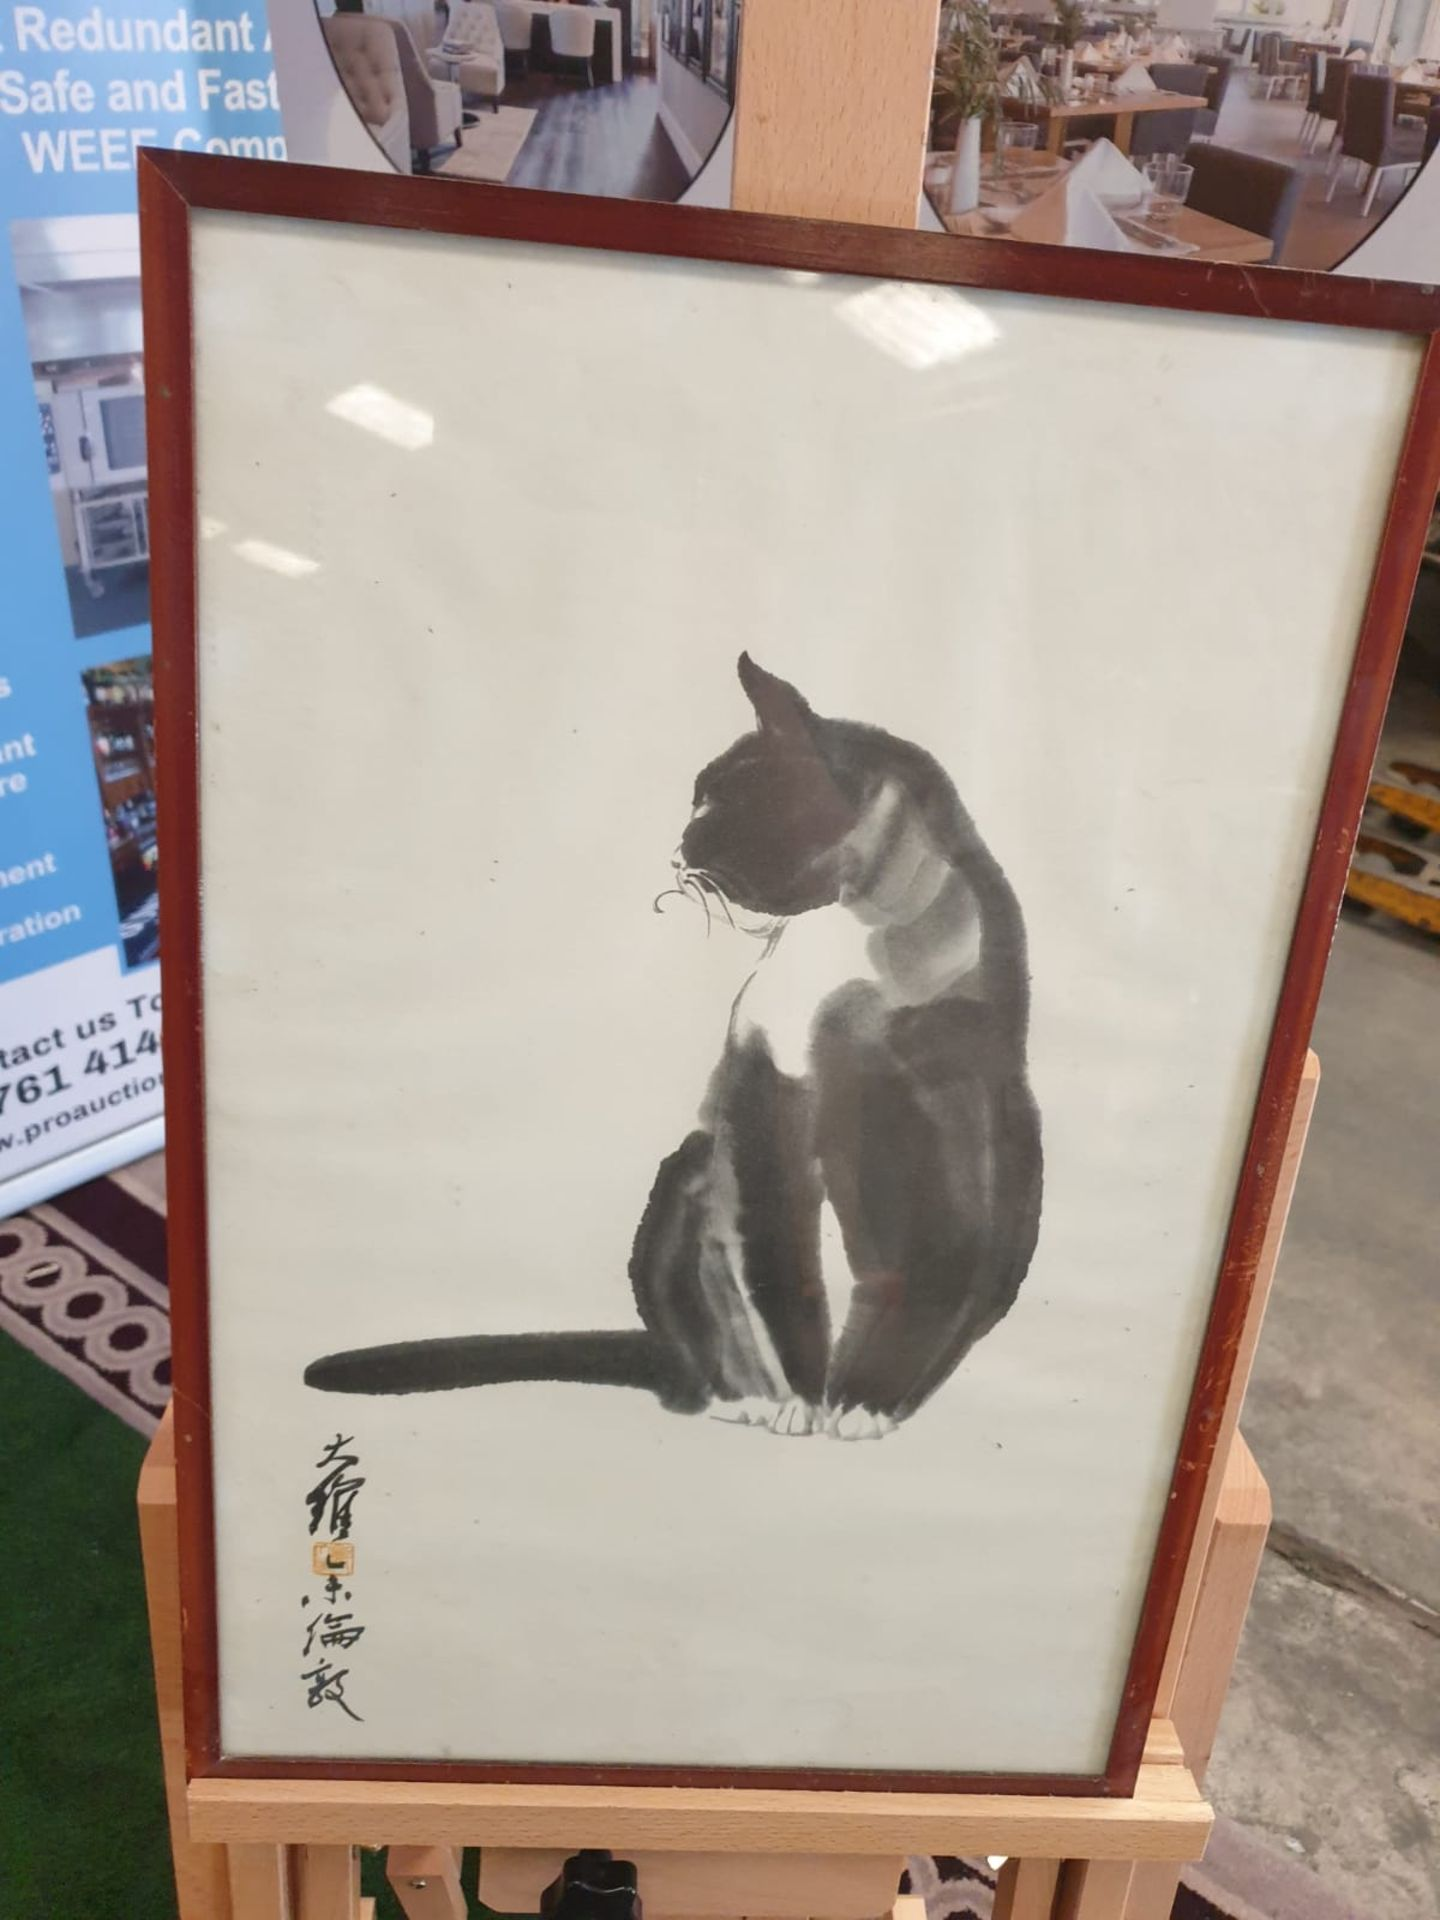 David Kwo Da-Wei (1919-2003) Chinese Lithographic Print Black Cat - Kim Da Wei Kwo, David Kwo 1919- - Image 3 of 4